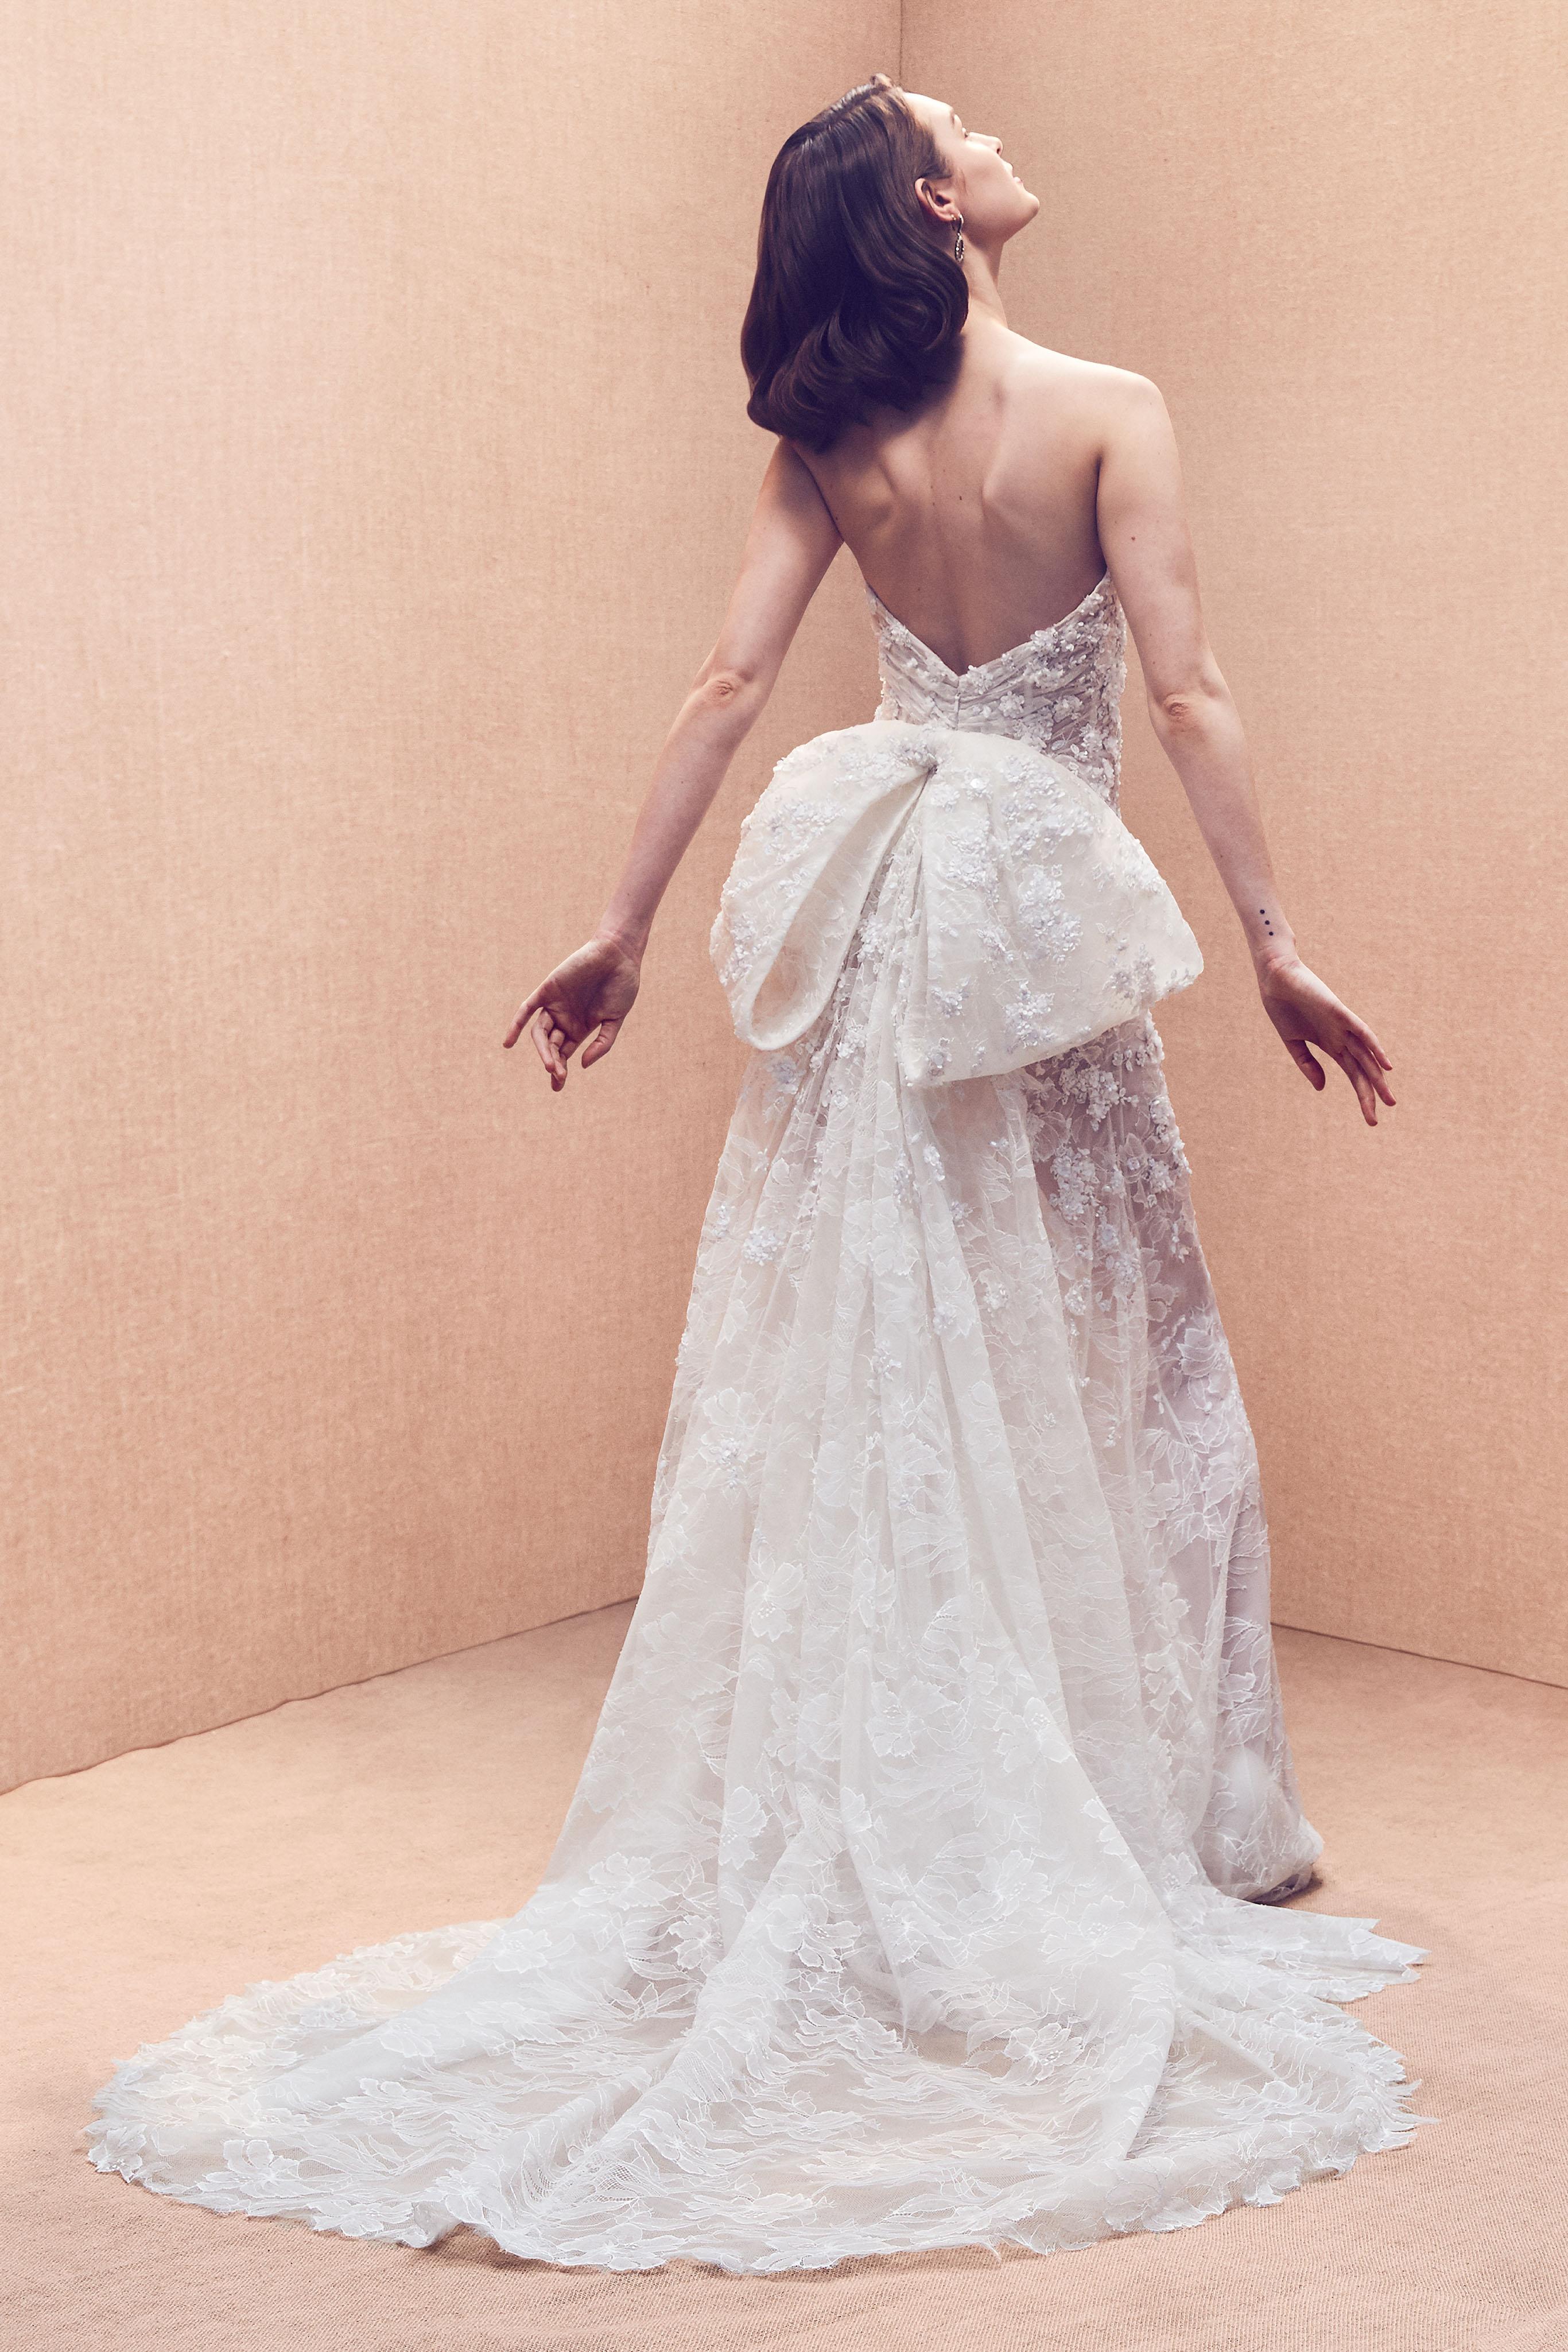 strapless open back large bow train lace floral applique glitter a-line wedding dress Oscar de la Renta Spring 2020